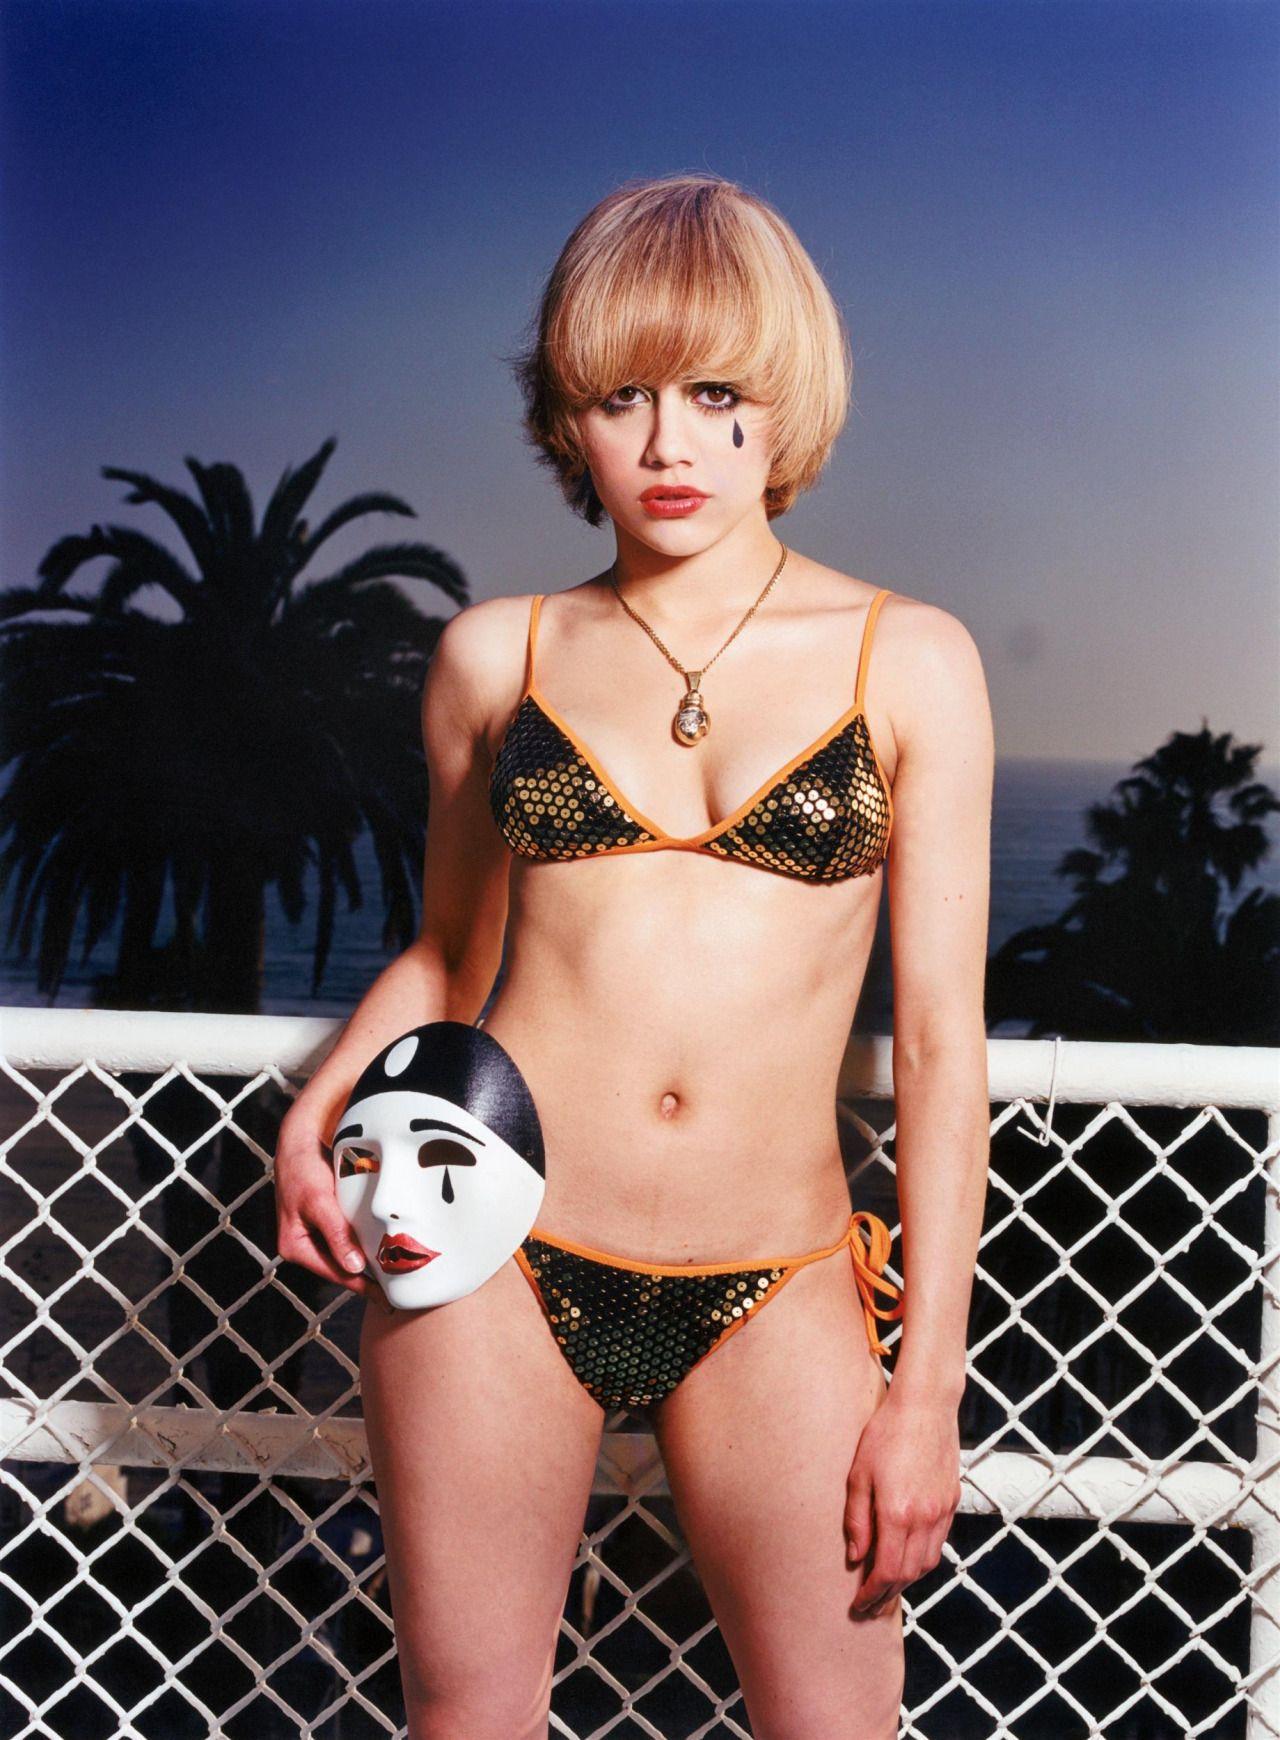 Shine apologise, britanny murphy bikini think